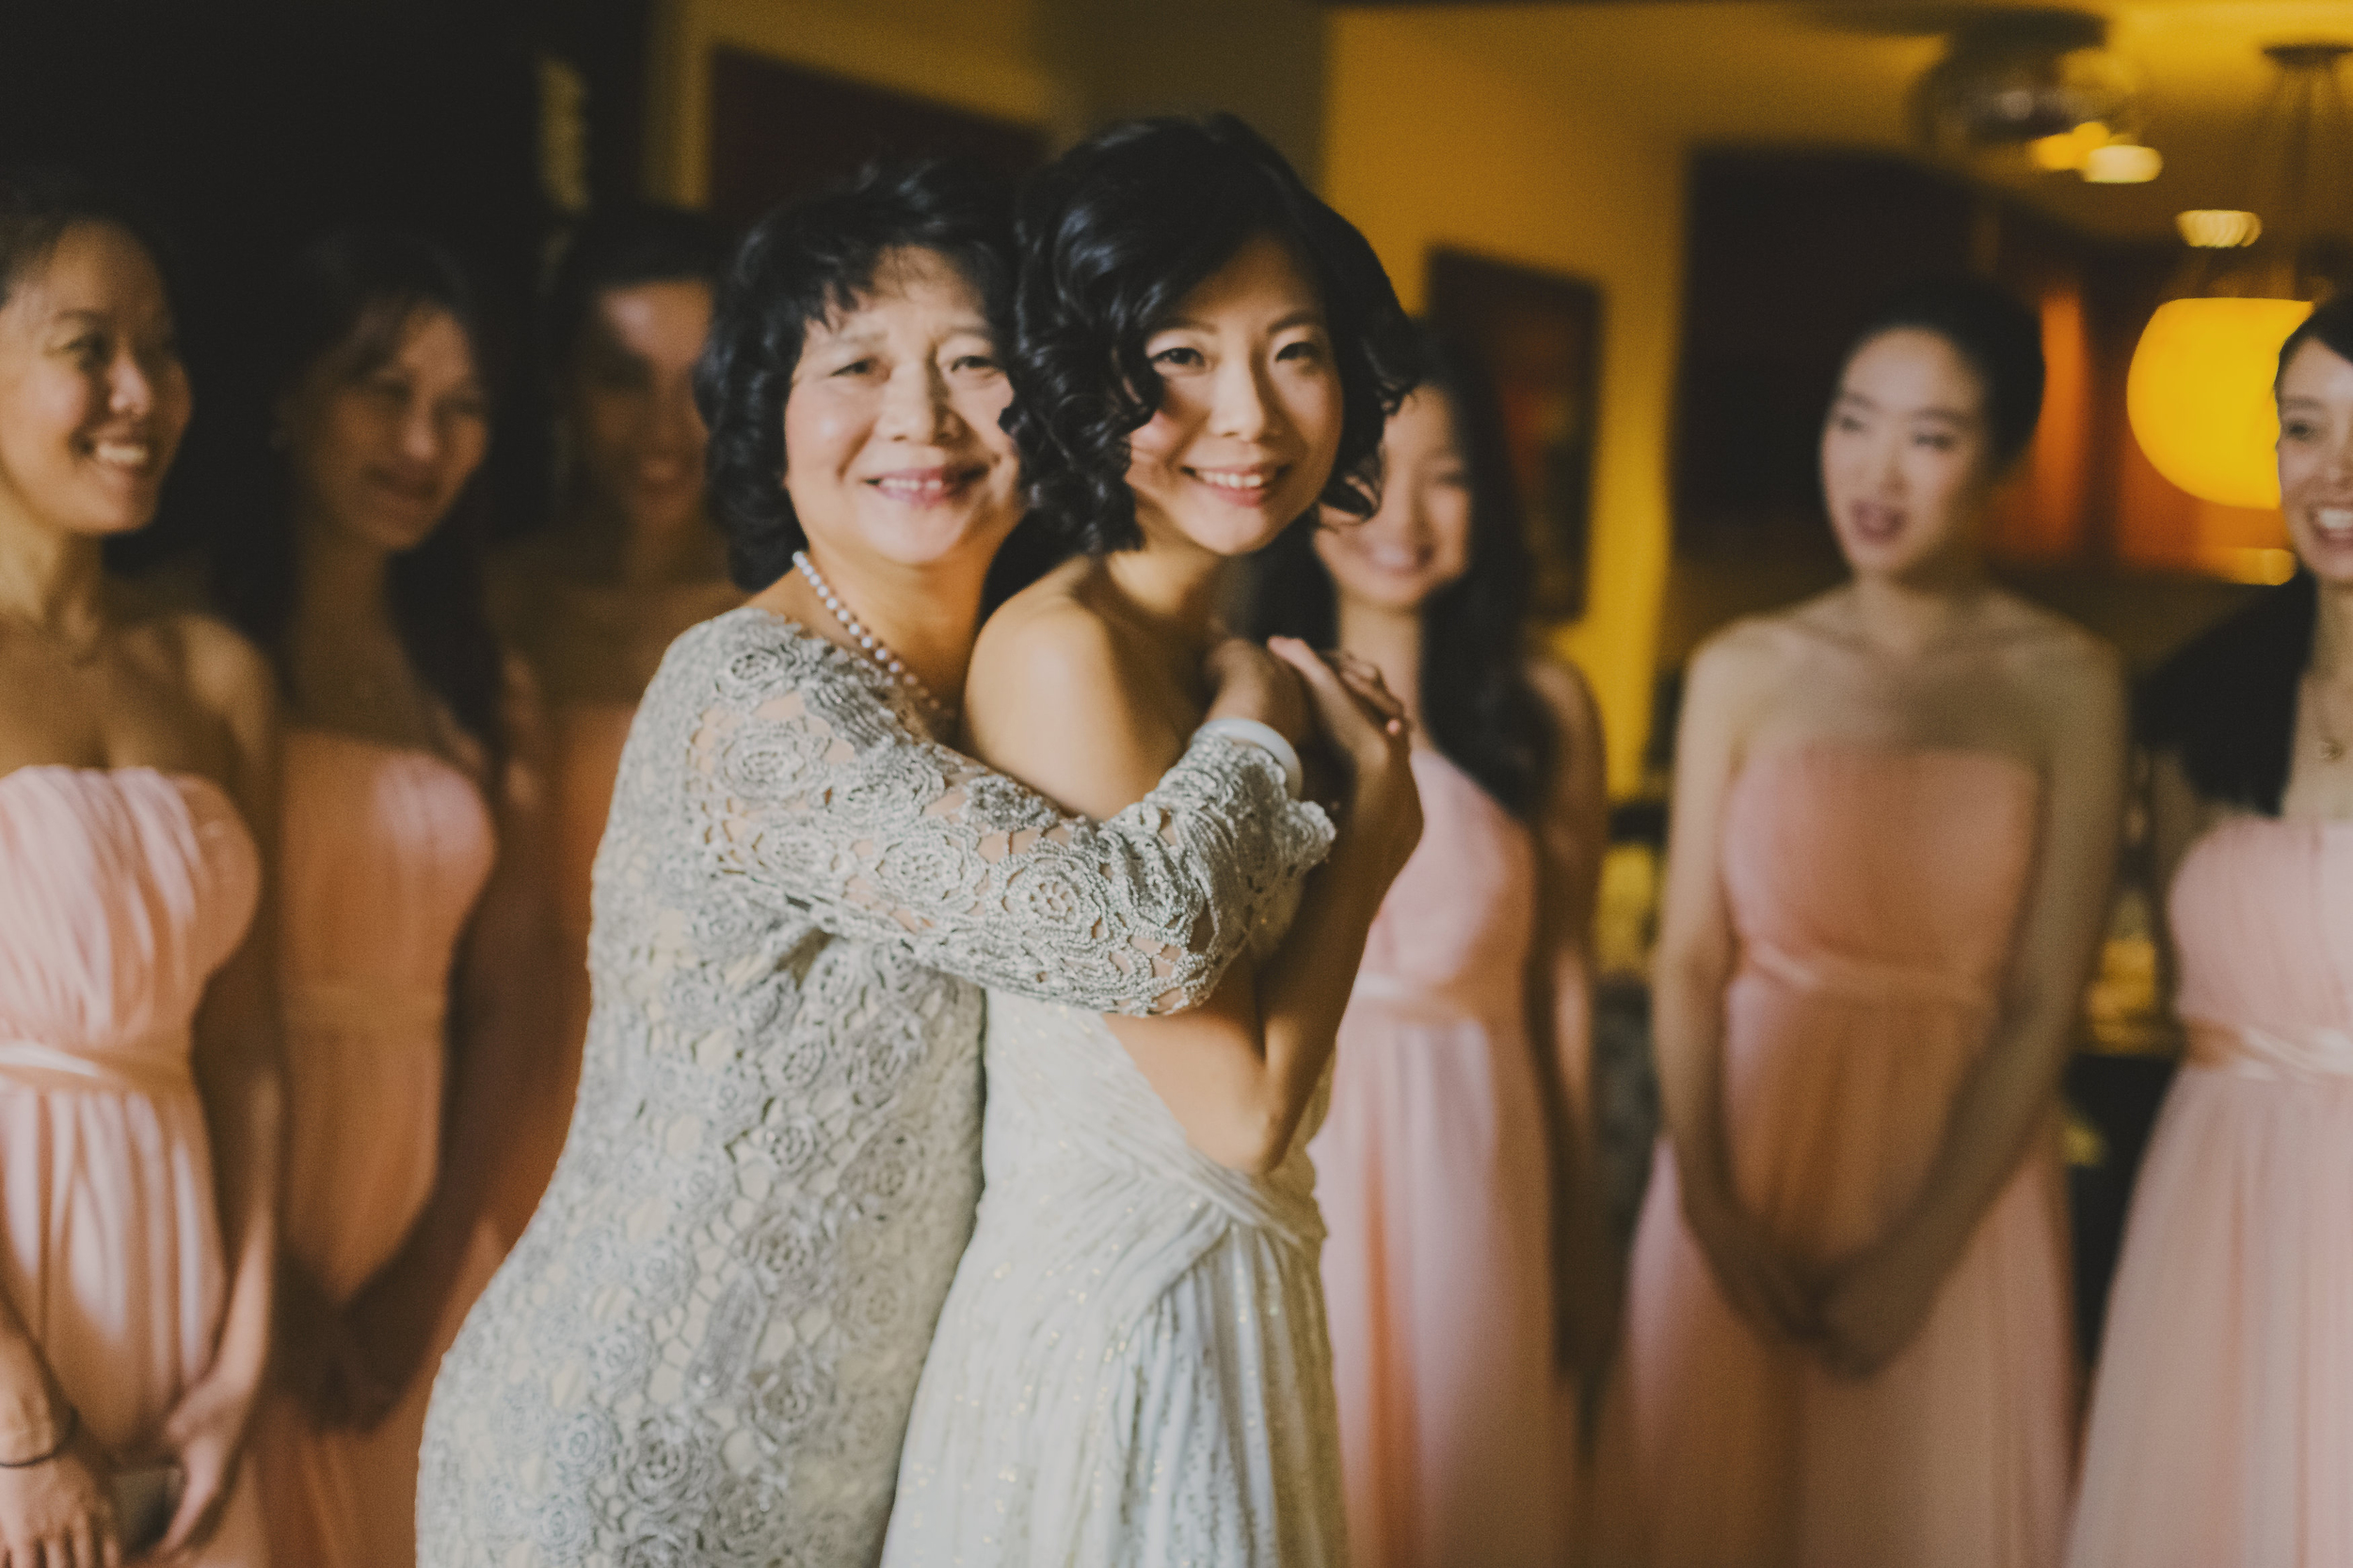 angie-diaz-photography-oahu-wedding-lanikuhonoa-shenshen-marshall-8.jpg